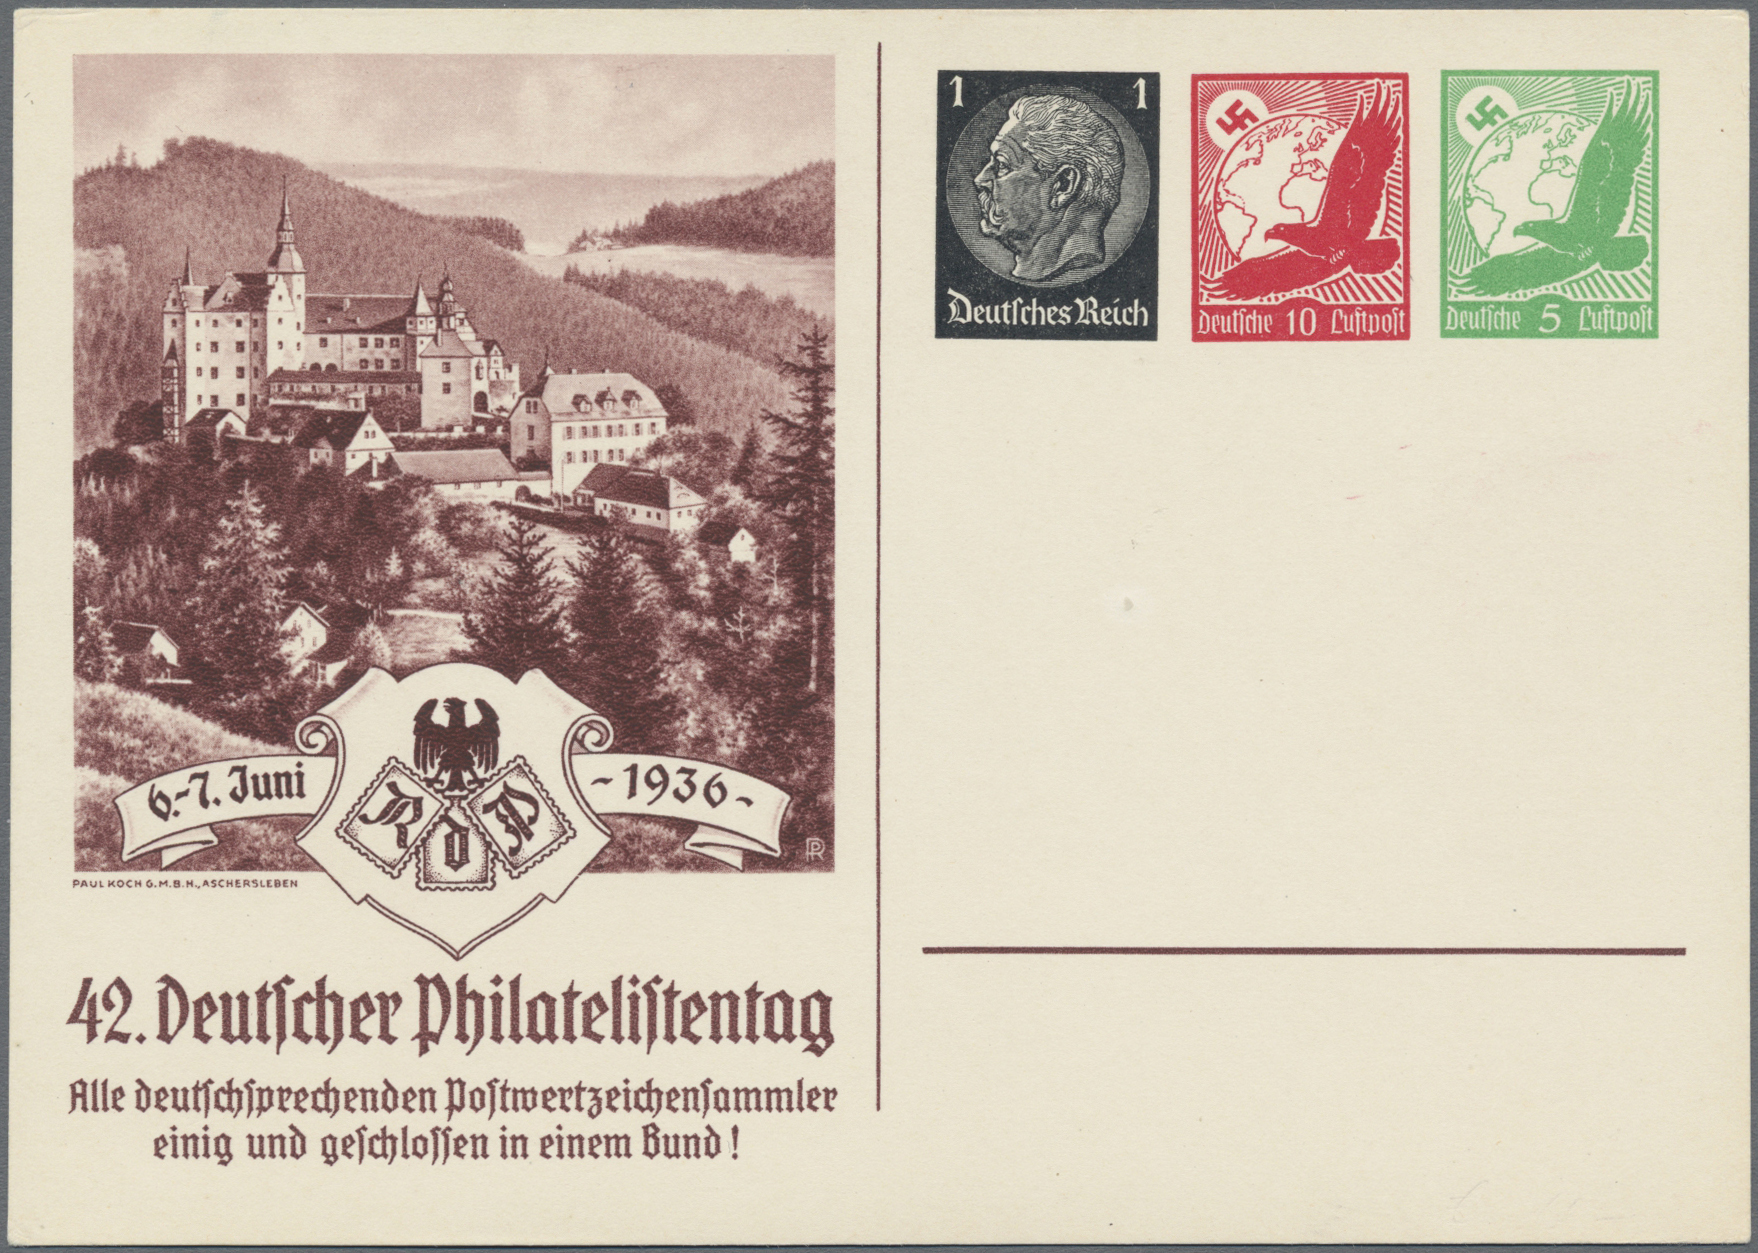 Lot 23547 - Deutsches Reich - Privatganzsachen  -  Auktionshaus Christoph Gärtner GmbH & Co. KG Sale #49 Collections Overseas, Thematics, Europe, Germany/Estates